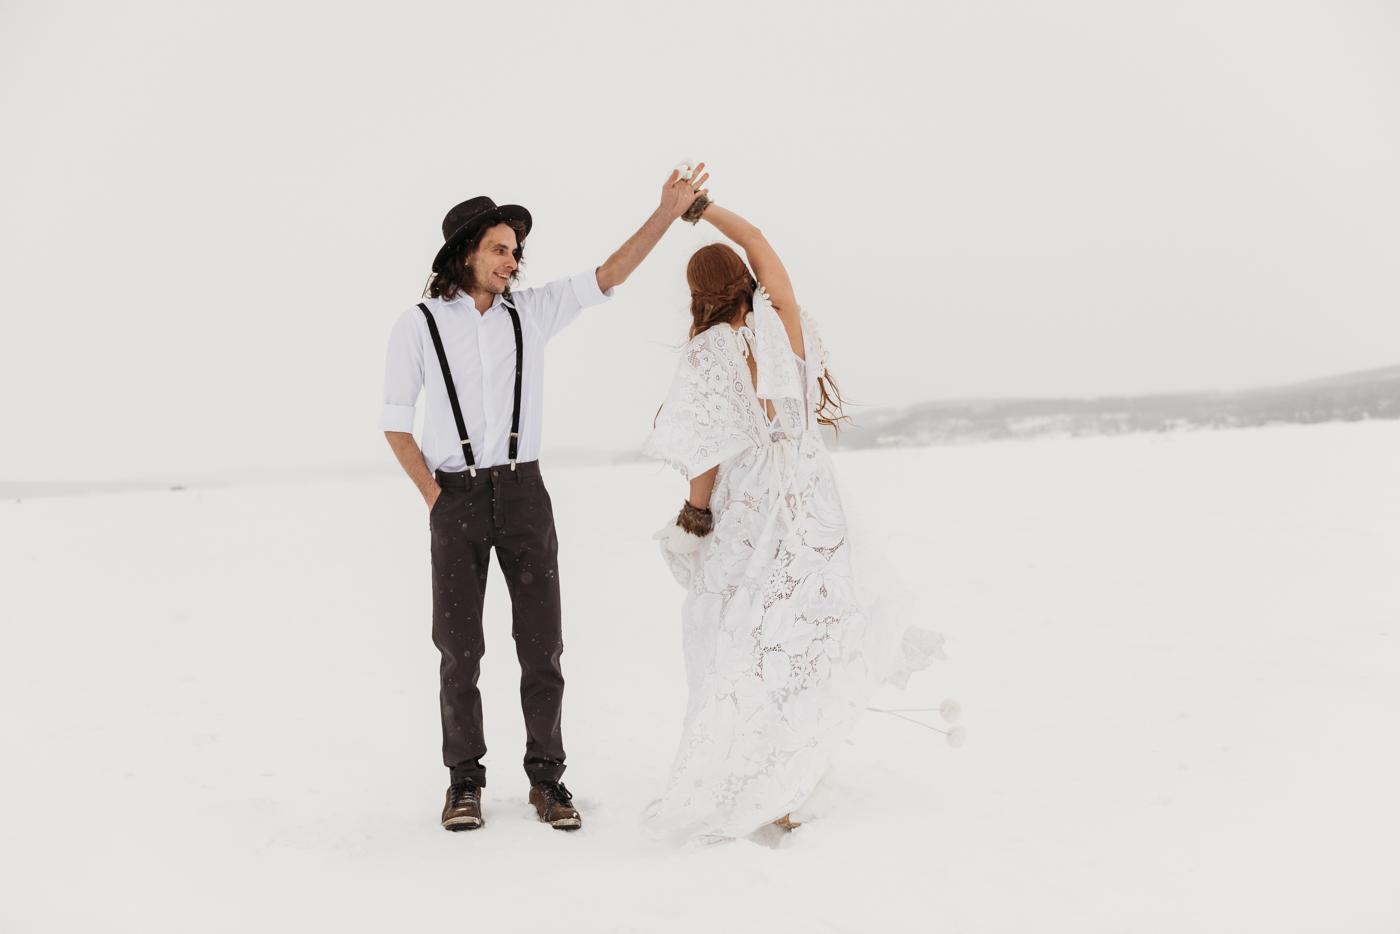 FortSt.John_photographer_TyraEPhotography_Wedding_Couple_Family_Photograhy_DawsonCreek_Elopement_Bride_Boduoir_Portraits-5018.jpg